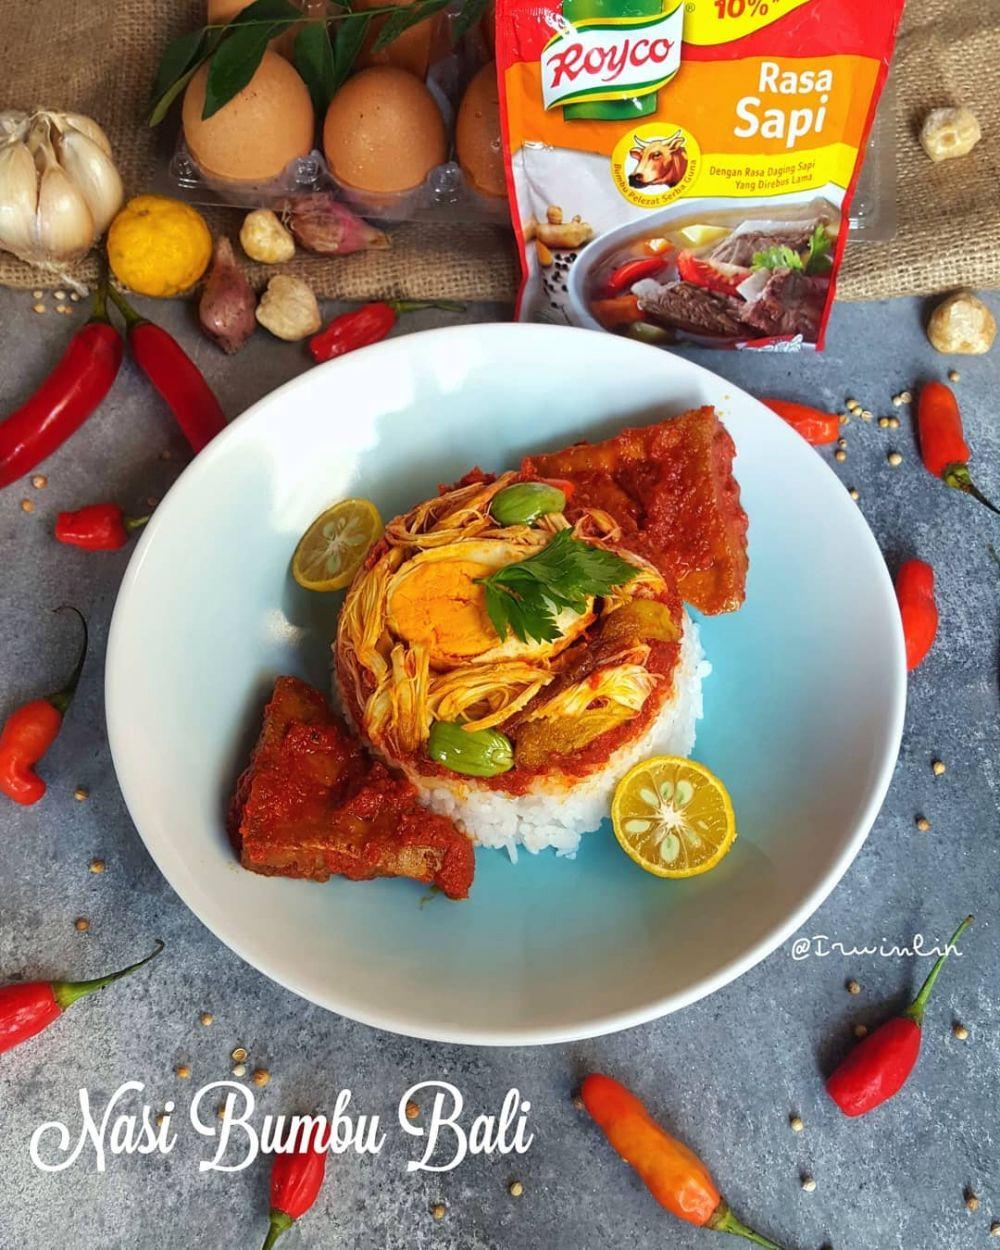 10 Resep Makanan Dengan Bumbu Bali Pedas Dan Mudah Dibuat